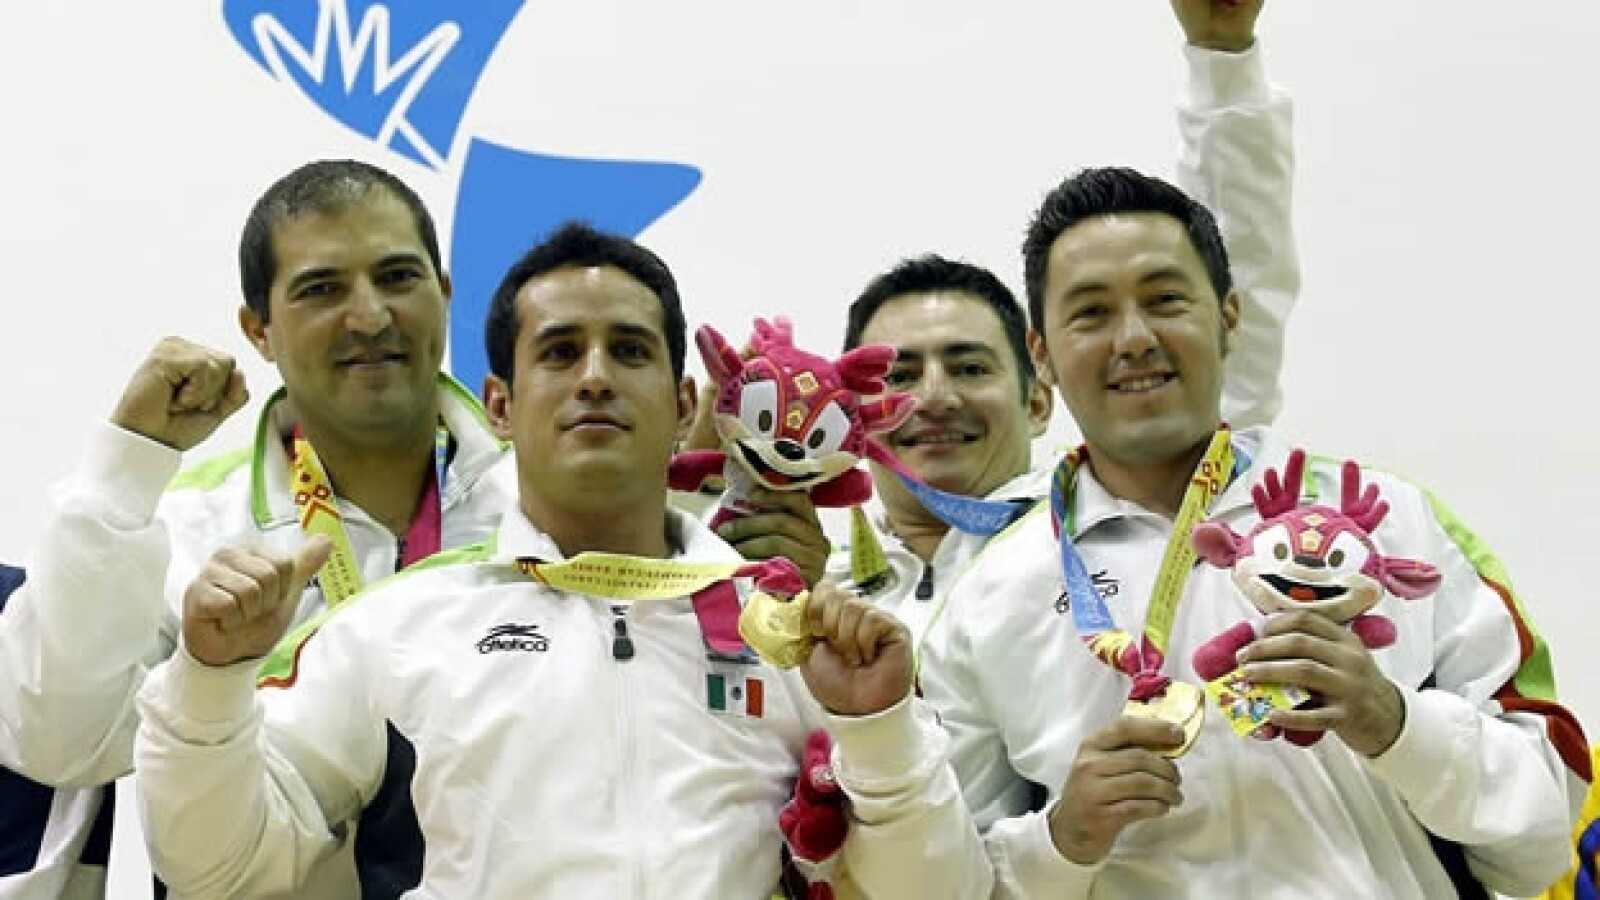 hombres equipo oro racquetbol panamericanos